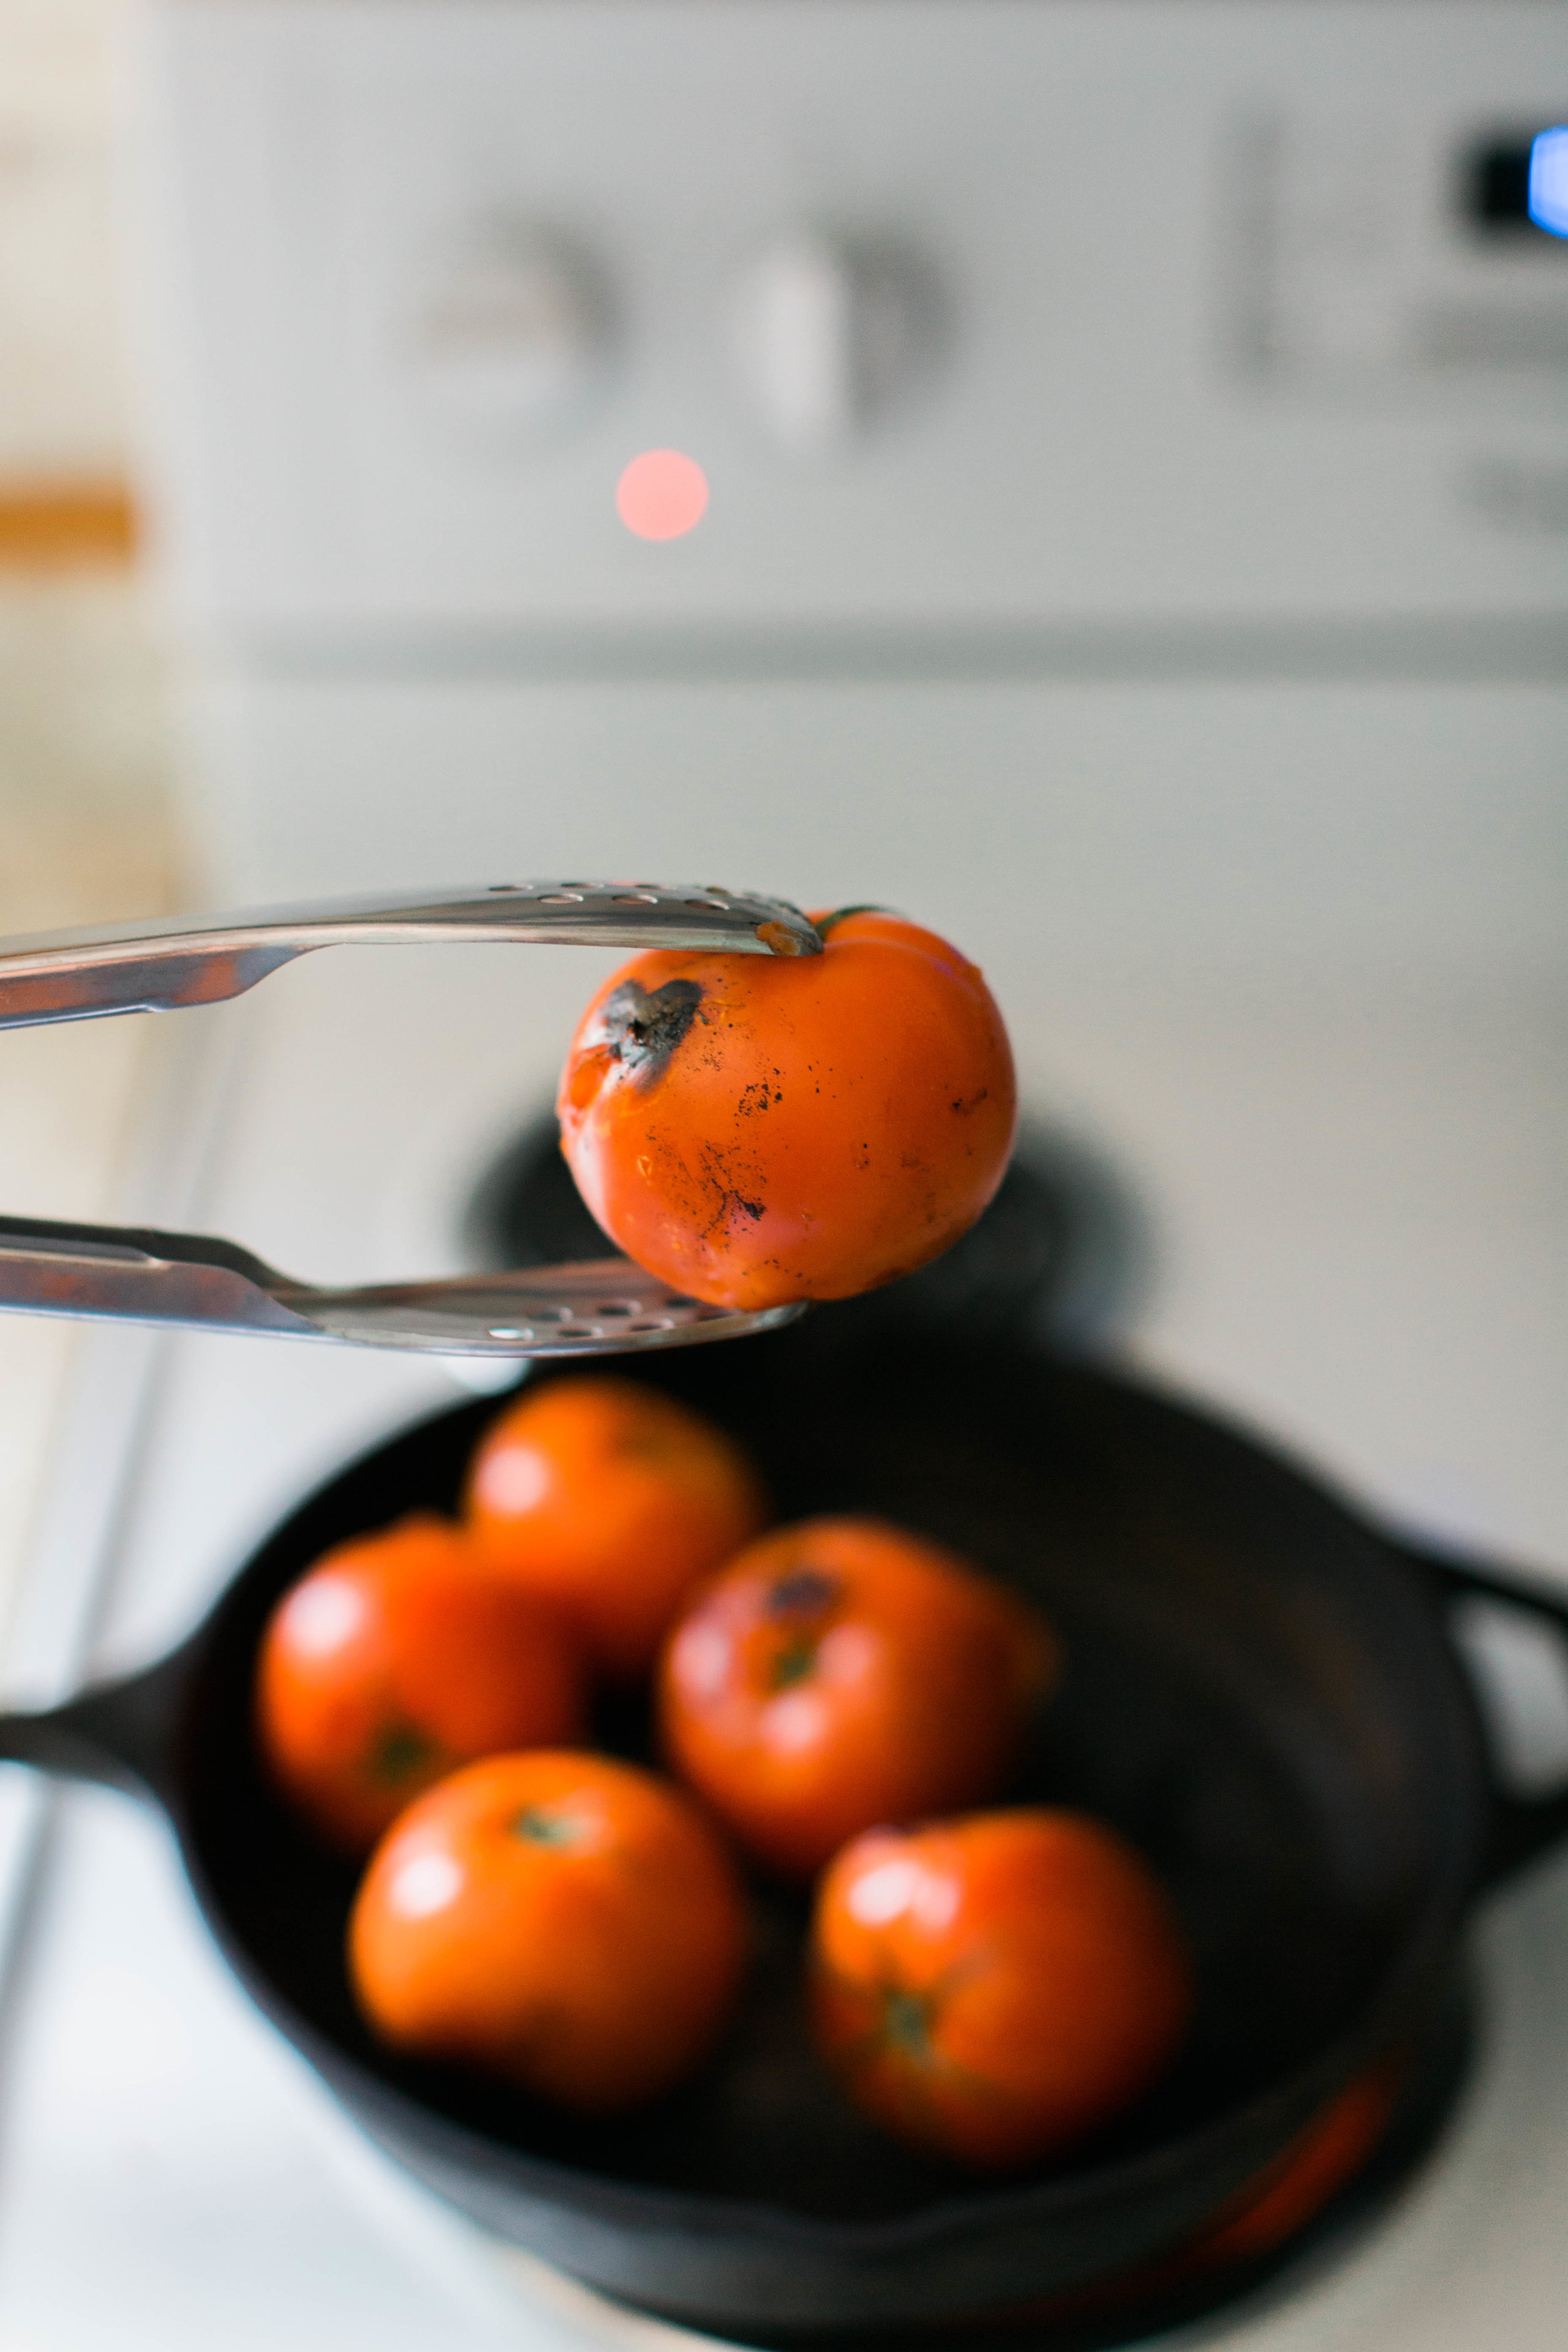 jennahazelphotography-simple-tomato-sauce-6535.jpg